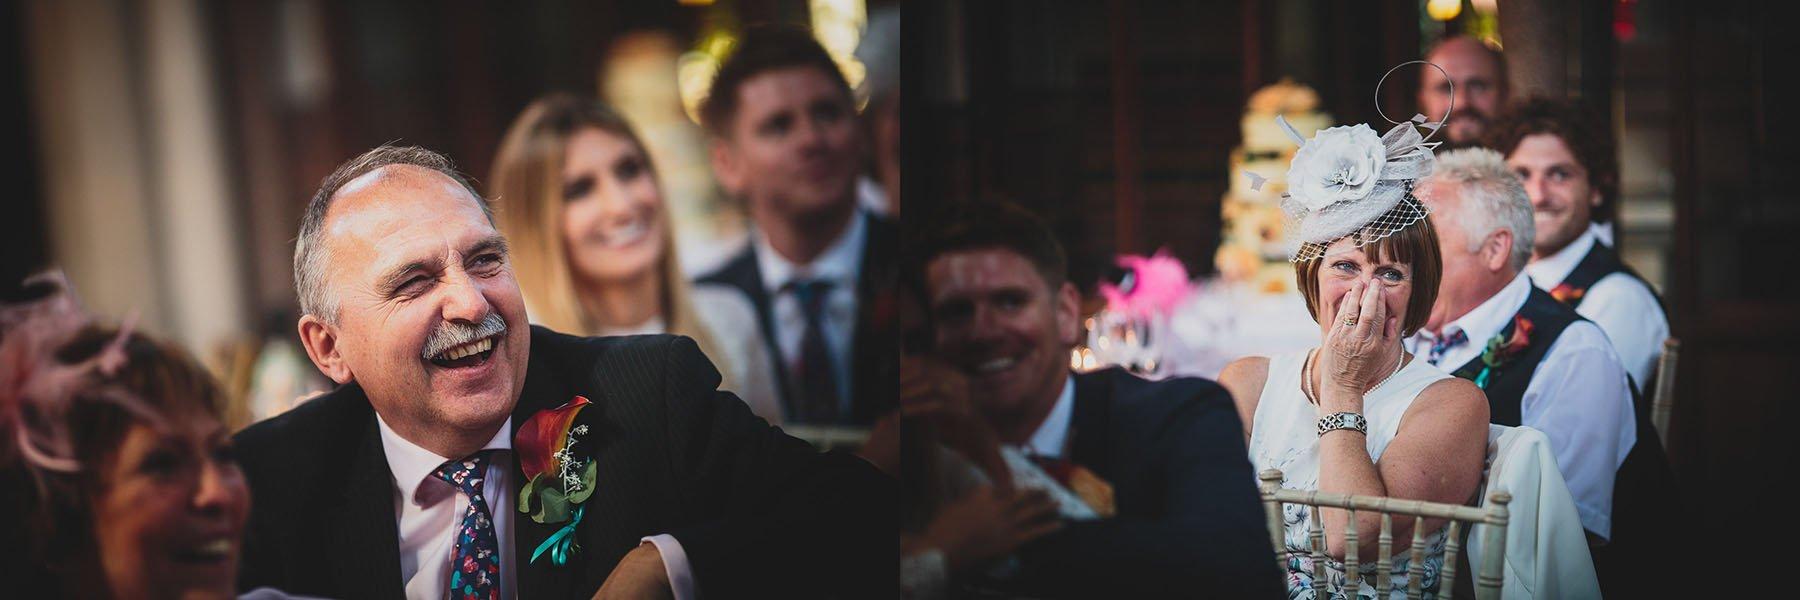 eastbourne-wedding-photography-hannah-tom-060